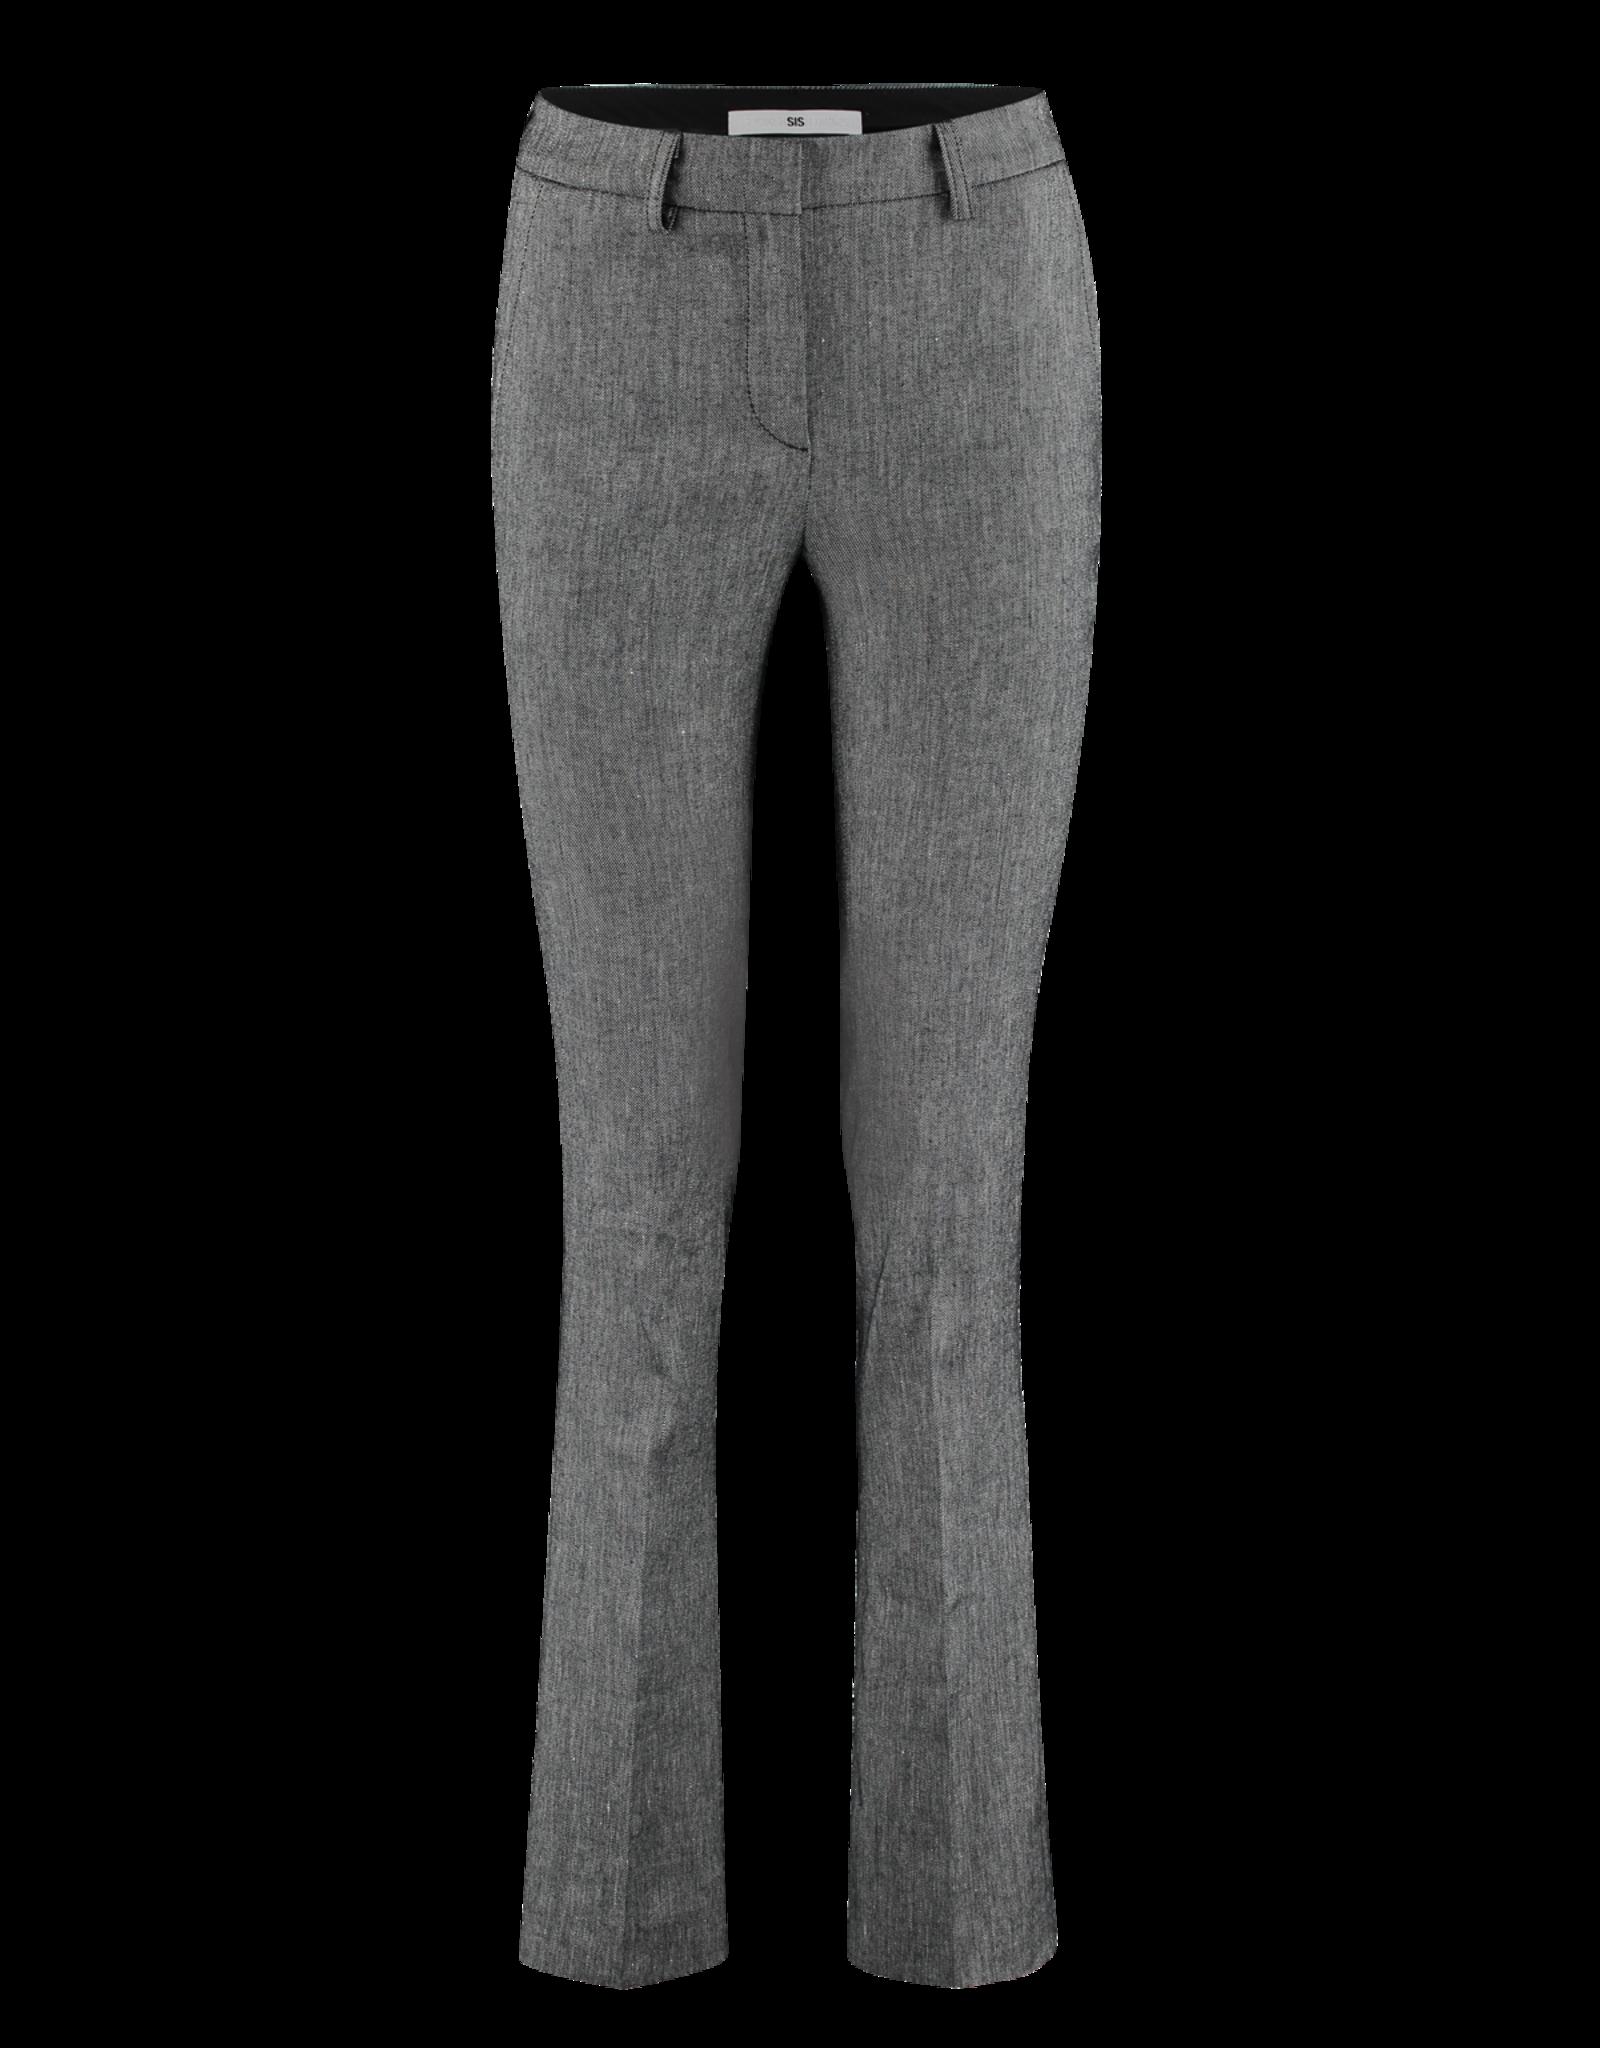 SIS by Spijkers en Spijkers SS20 206-X Long Flair Pants